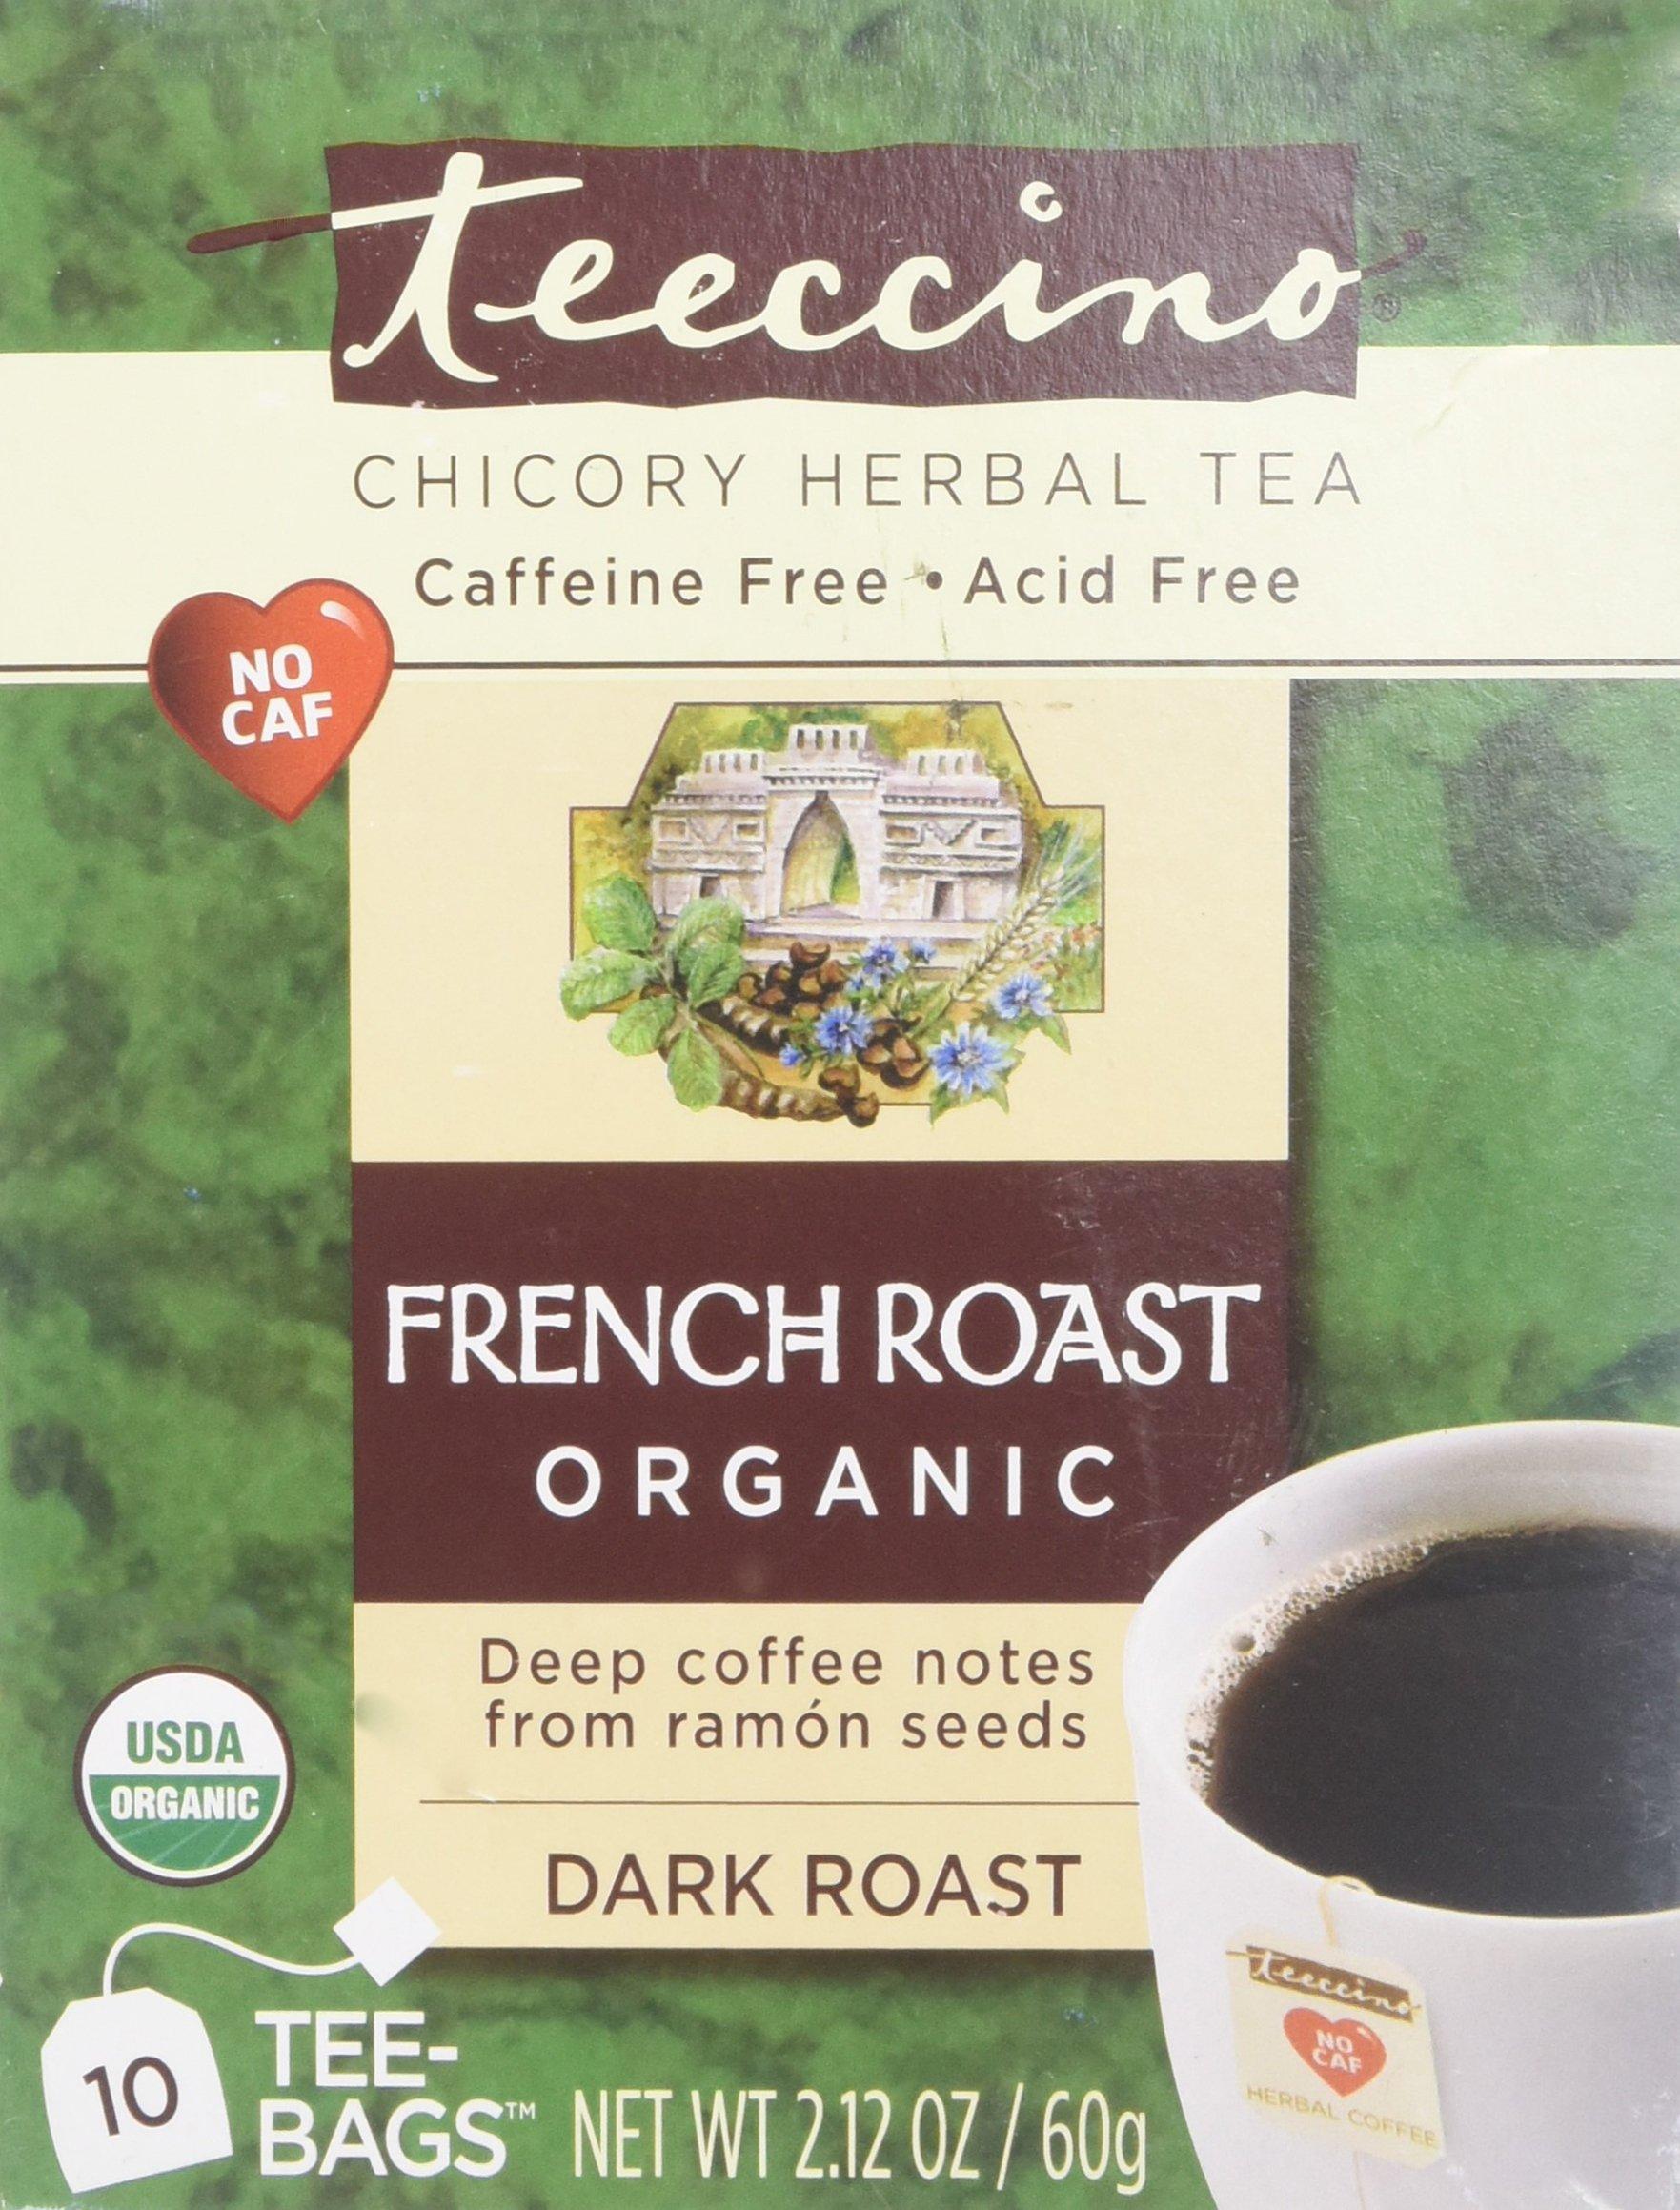 Teeccino French Roast Organic Chicory Herbal Tea Bags, Caffeine Free, Acid Free, 10 Count